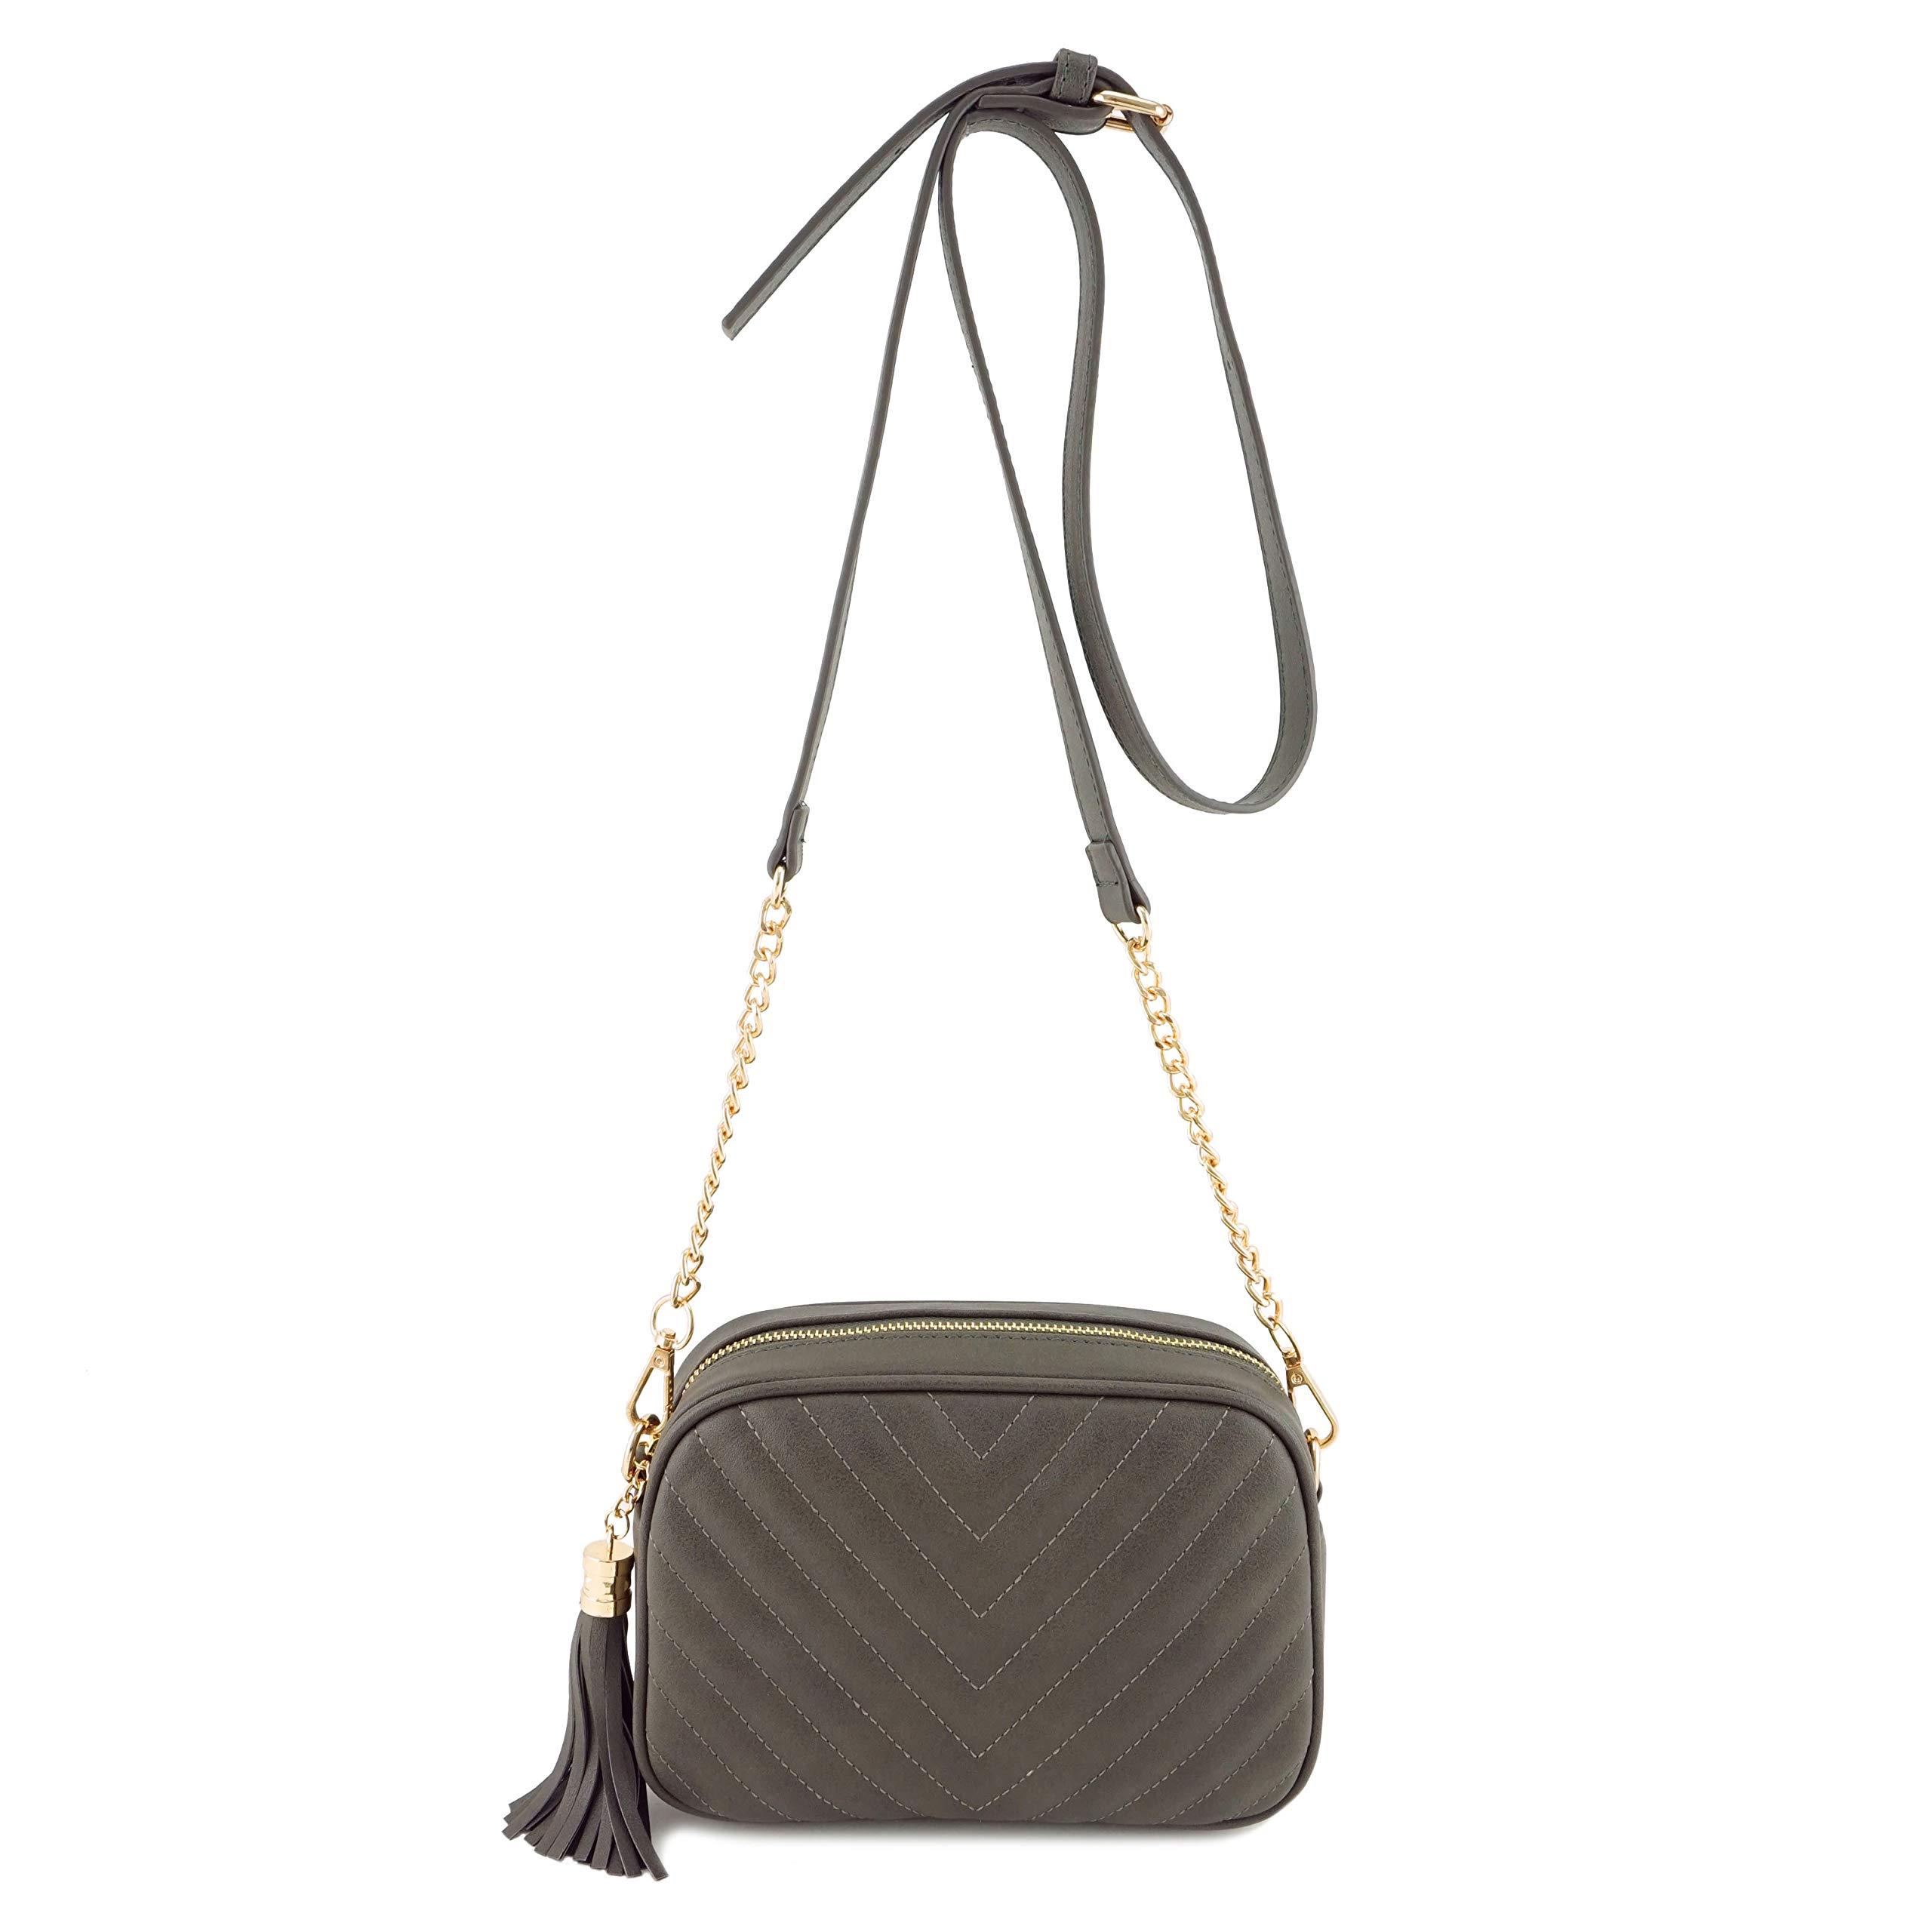 Simple Shoulder Crossbody Bag With Metal Chain Strap And Tassel Top Zipper (Dk Grey)